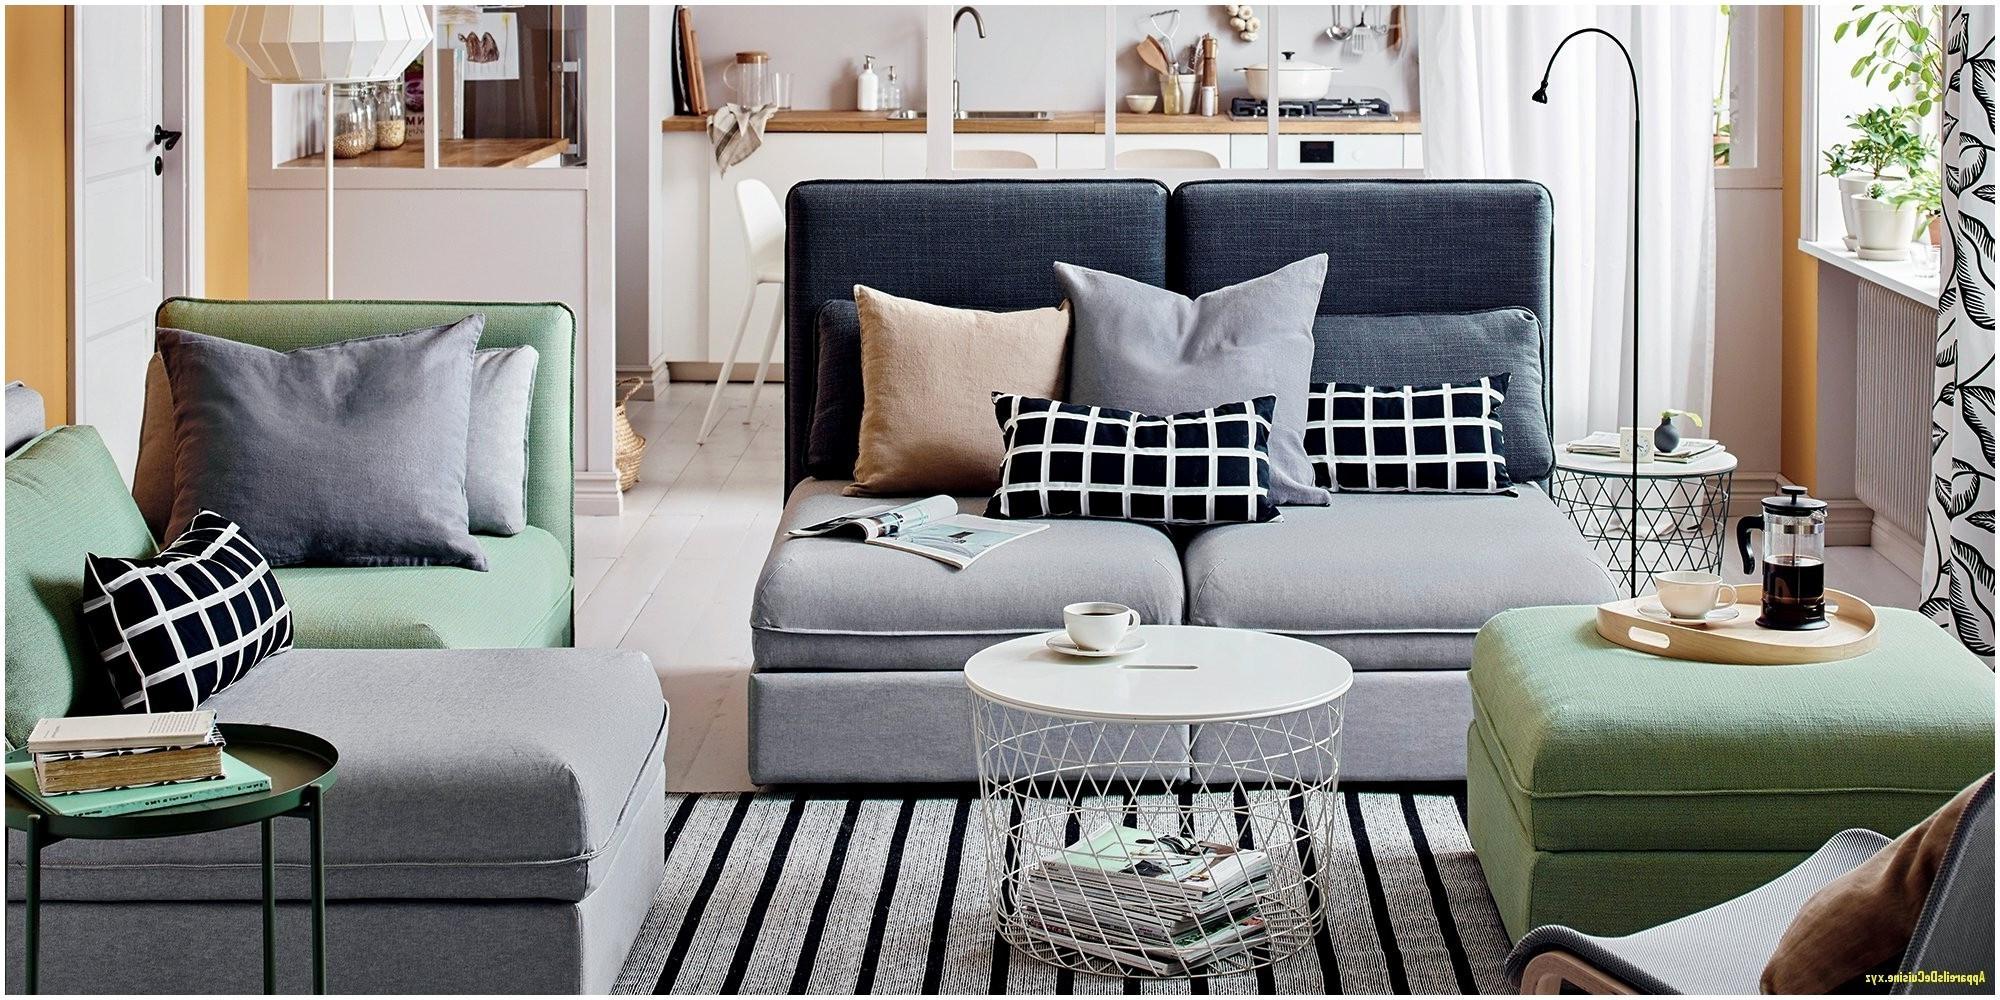 magasin meuble turc 30 inspire magasin de meuble turque of magasin meuble turc